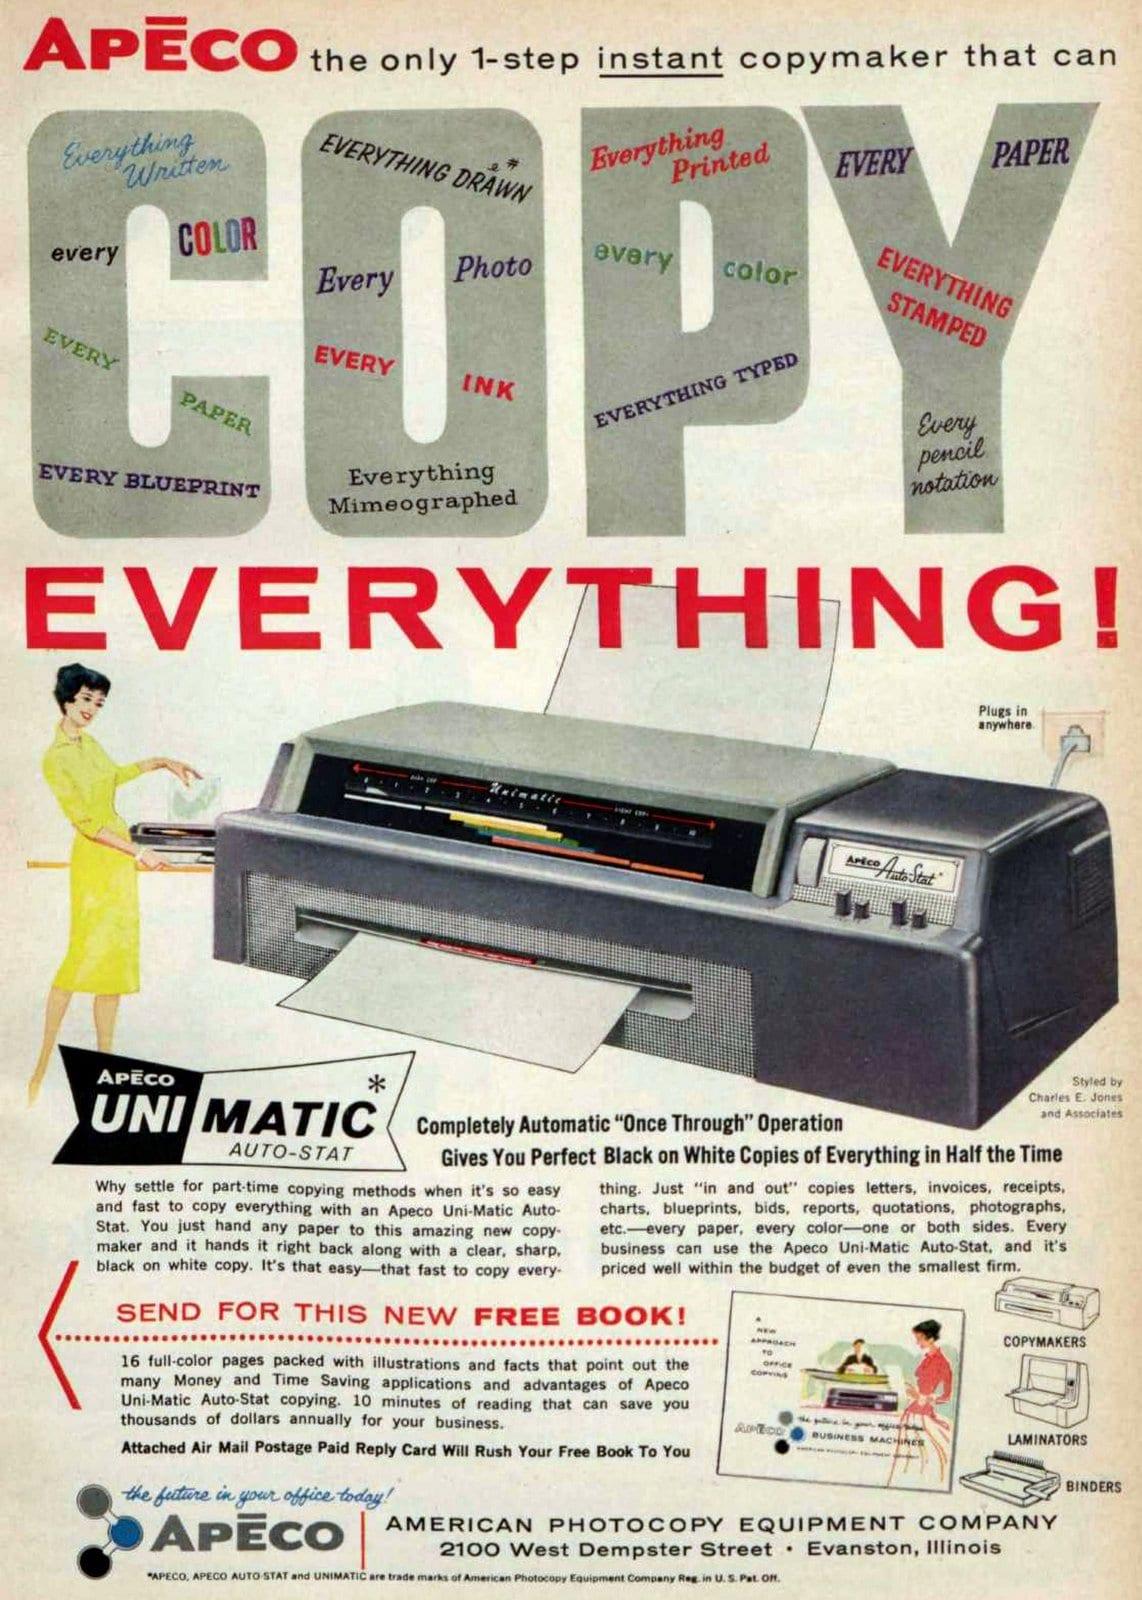 Vintage Apeco UniMatic Auto-Stat copying machine (1960)